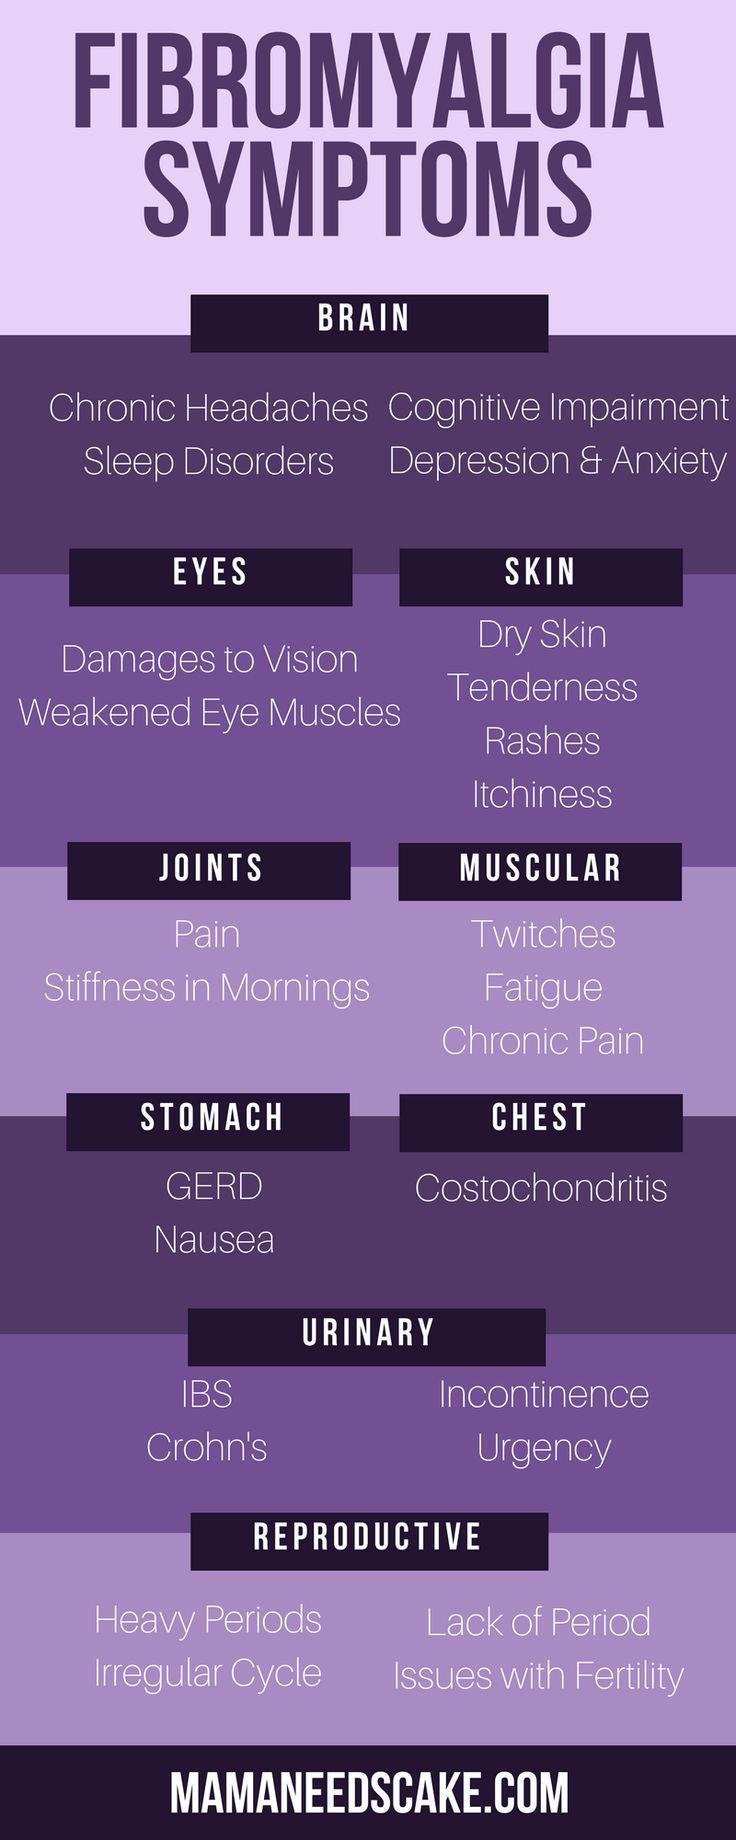 #Muskuloskelettale #Fibromyalgie #Fibromyalgie #Fibromyalgie #Umwelt